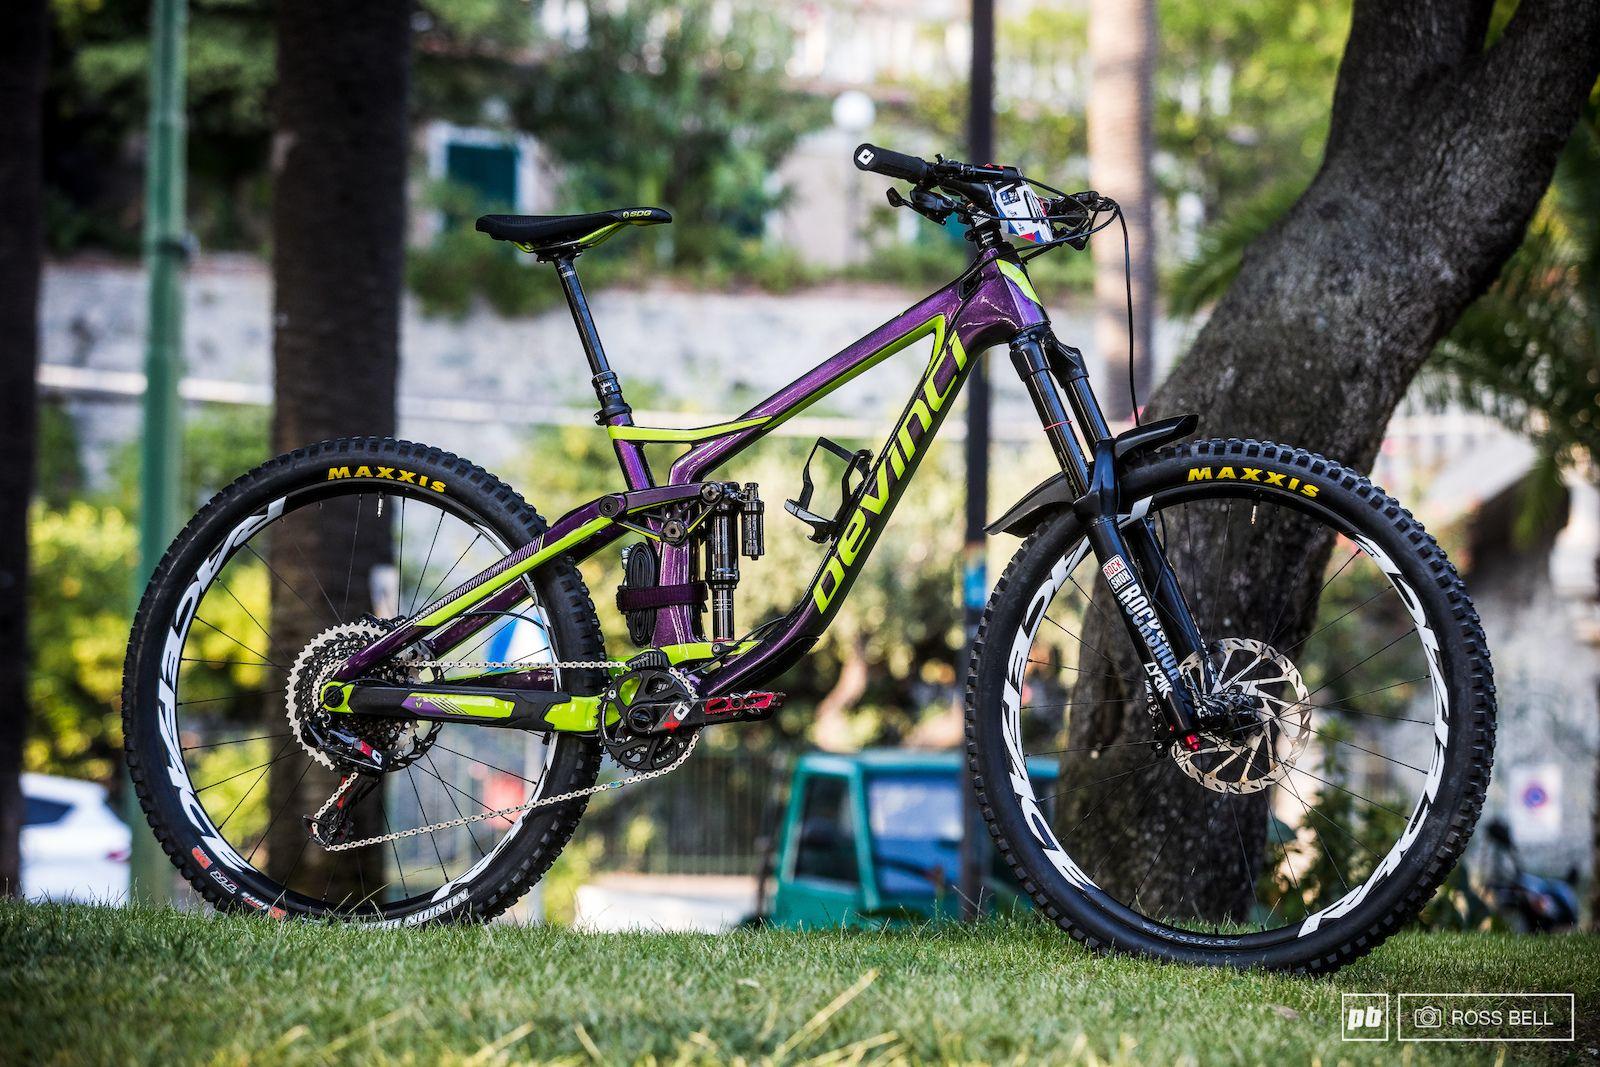 Damien Oton Bike Check With Images Bike Bike Design Bicycle